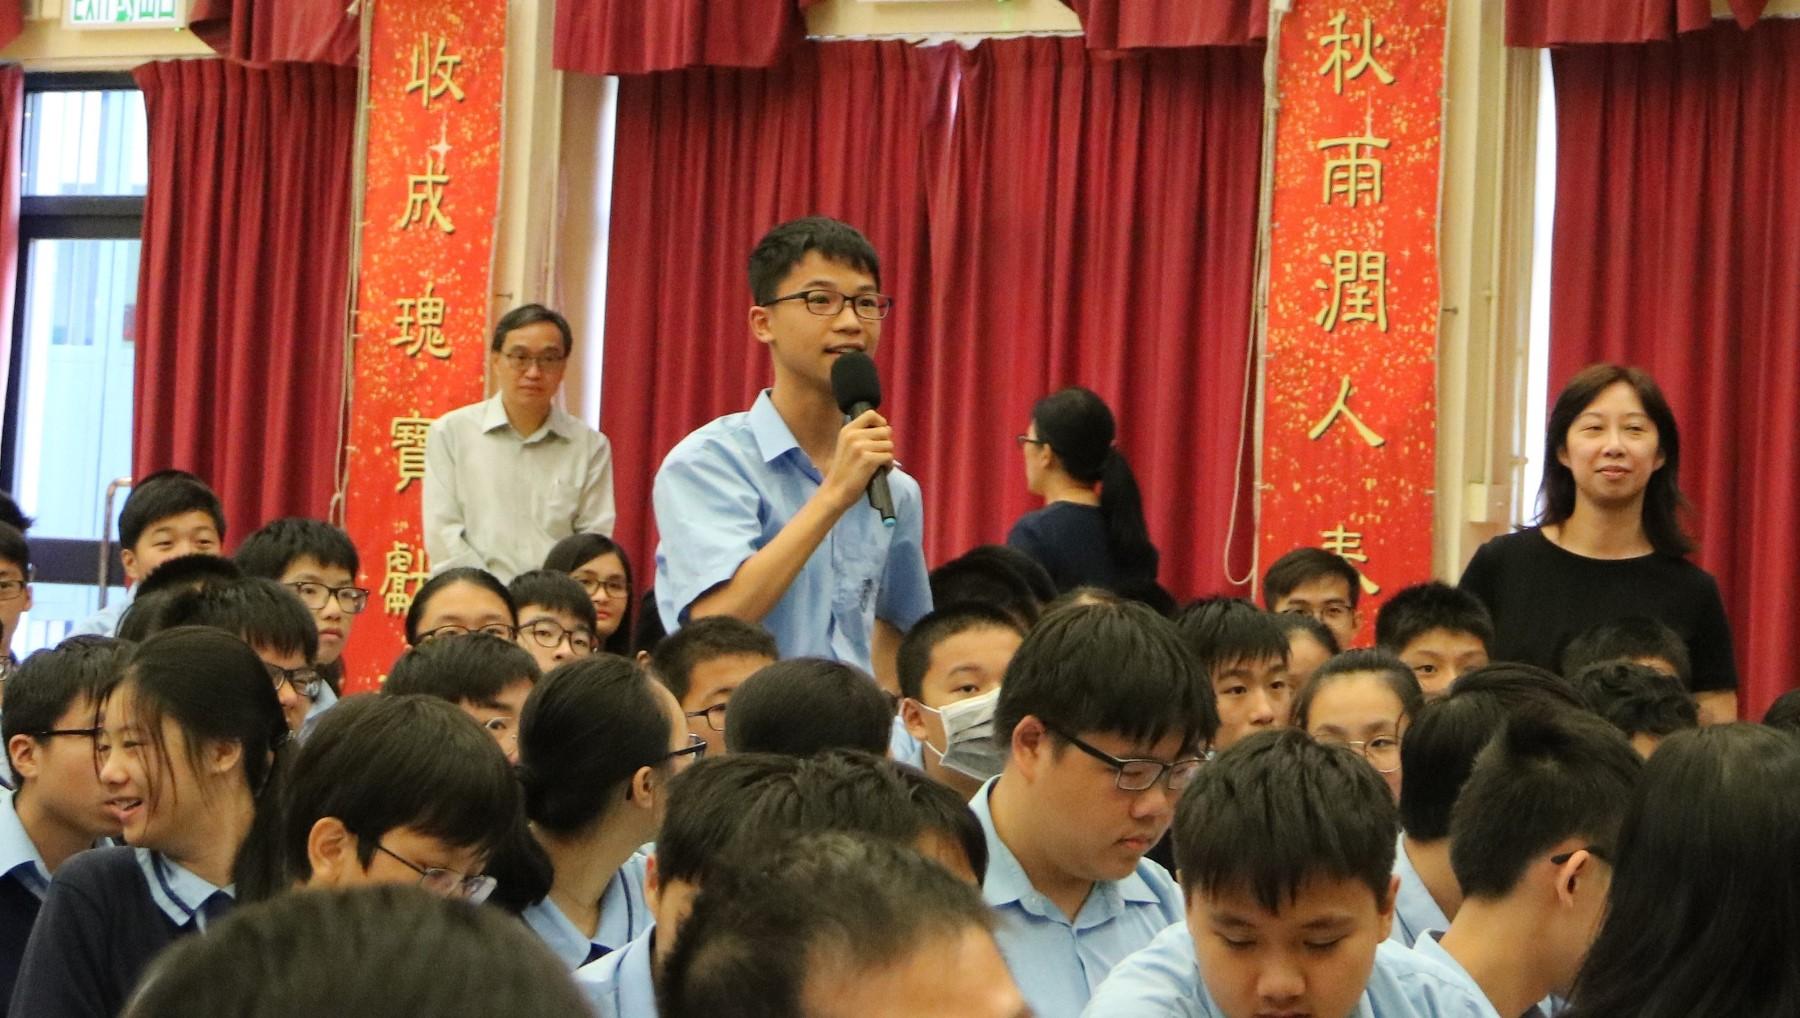 http://npc.edu.hk/sites/default/files/img_6727.jpg